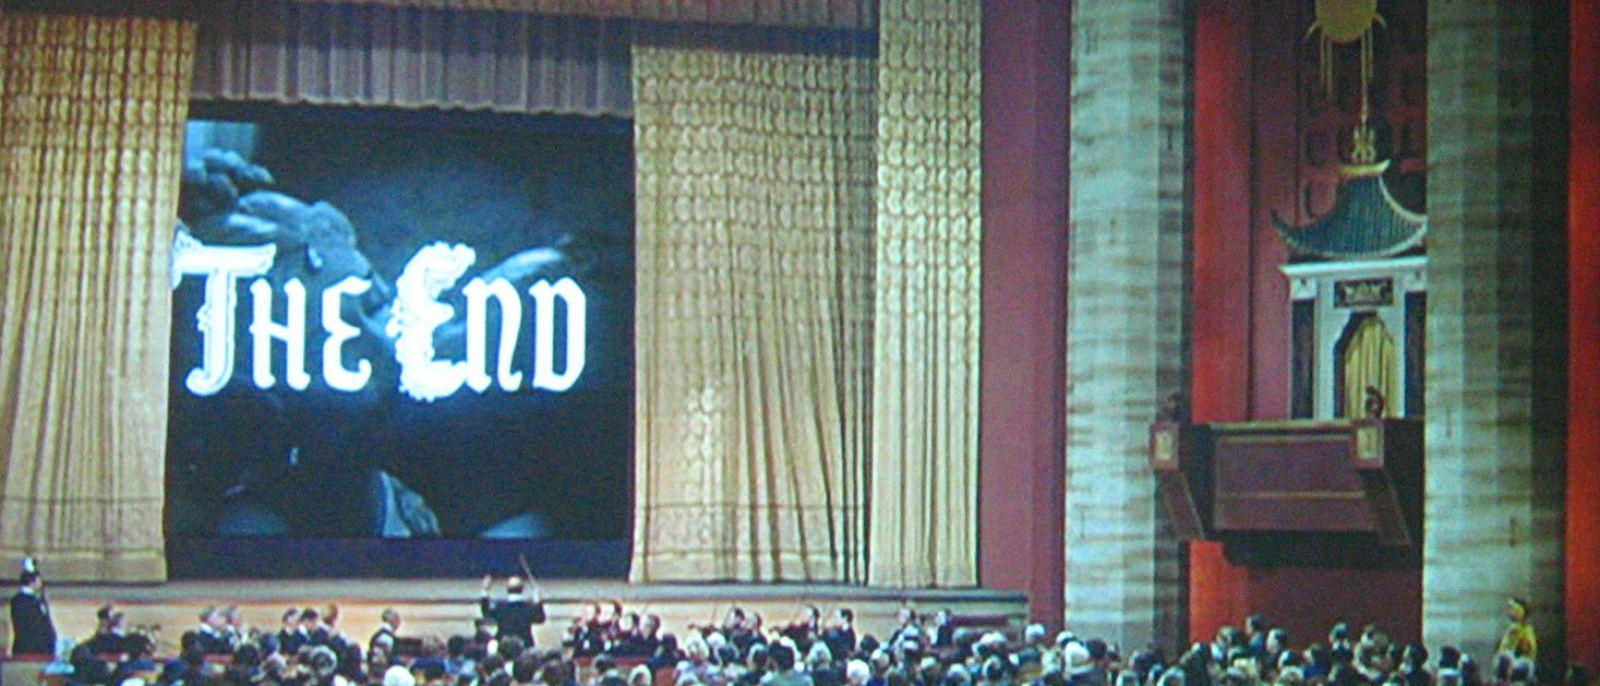 """Singin' in the Rain"" at Grauman's Chinese Theatre"